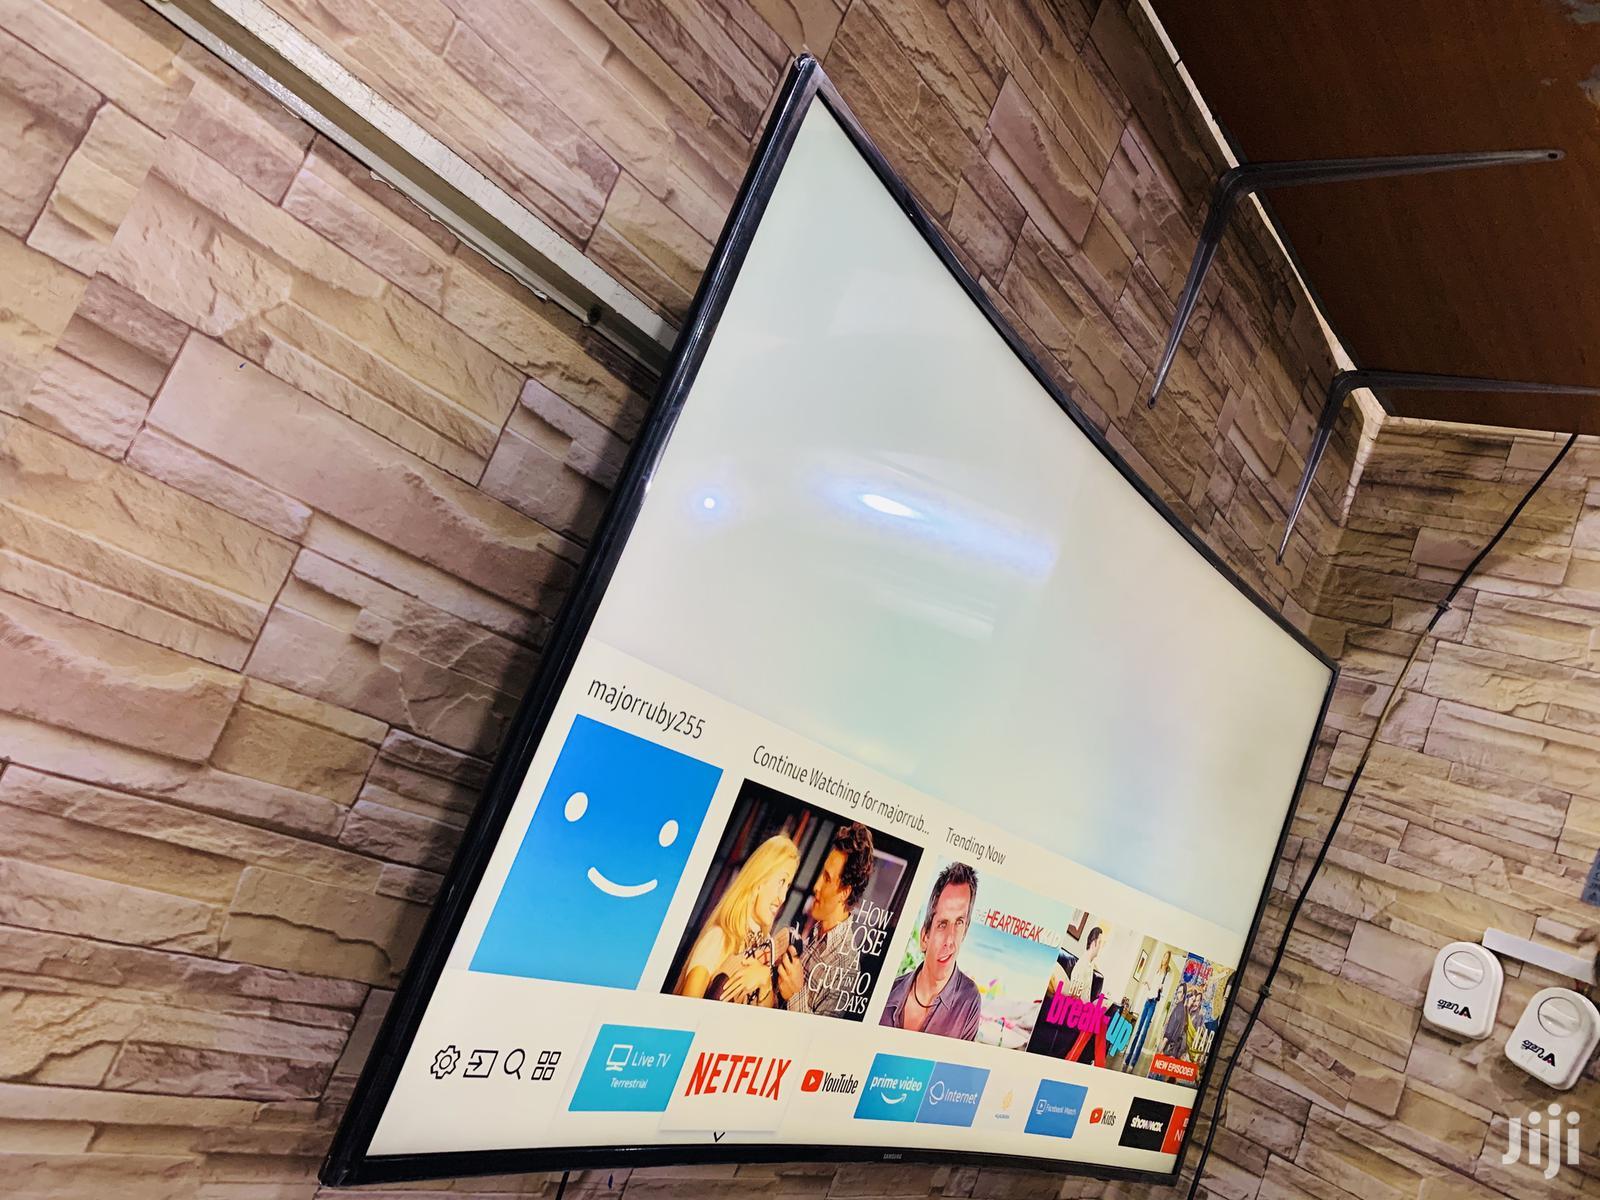 Samsung 55inches Curve Smart Tv UHD 4K | TV & DVD Equipment for sale in Kampala, Central Region, Uganda